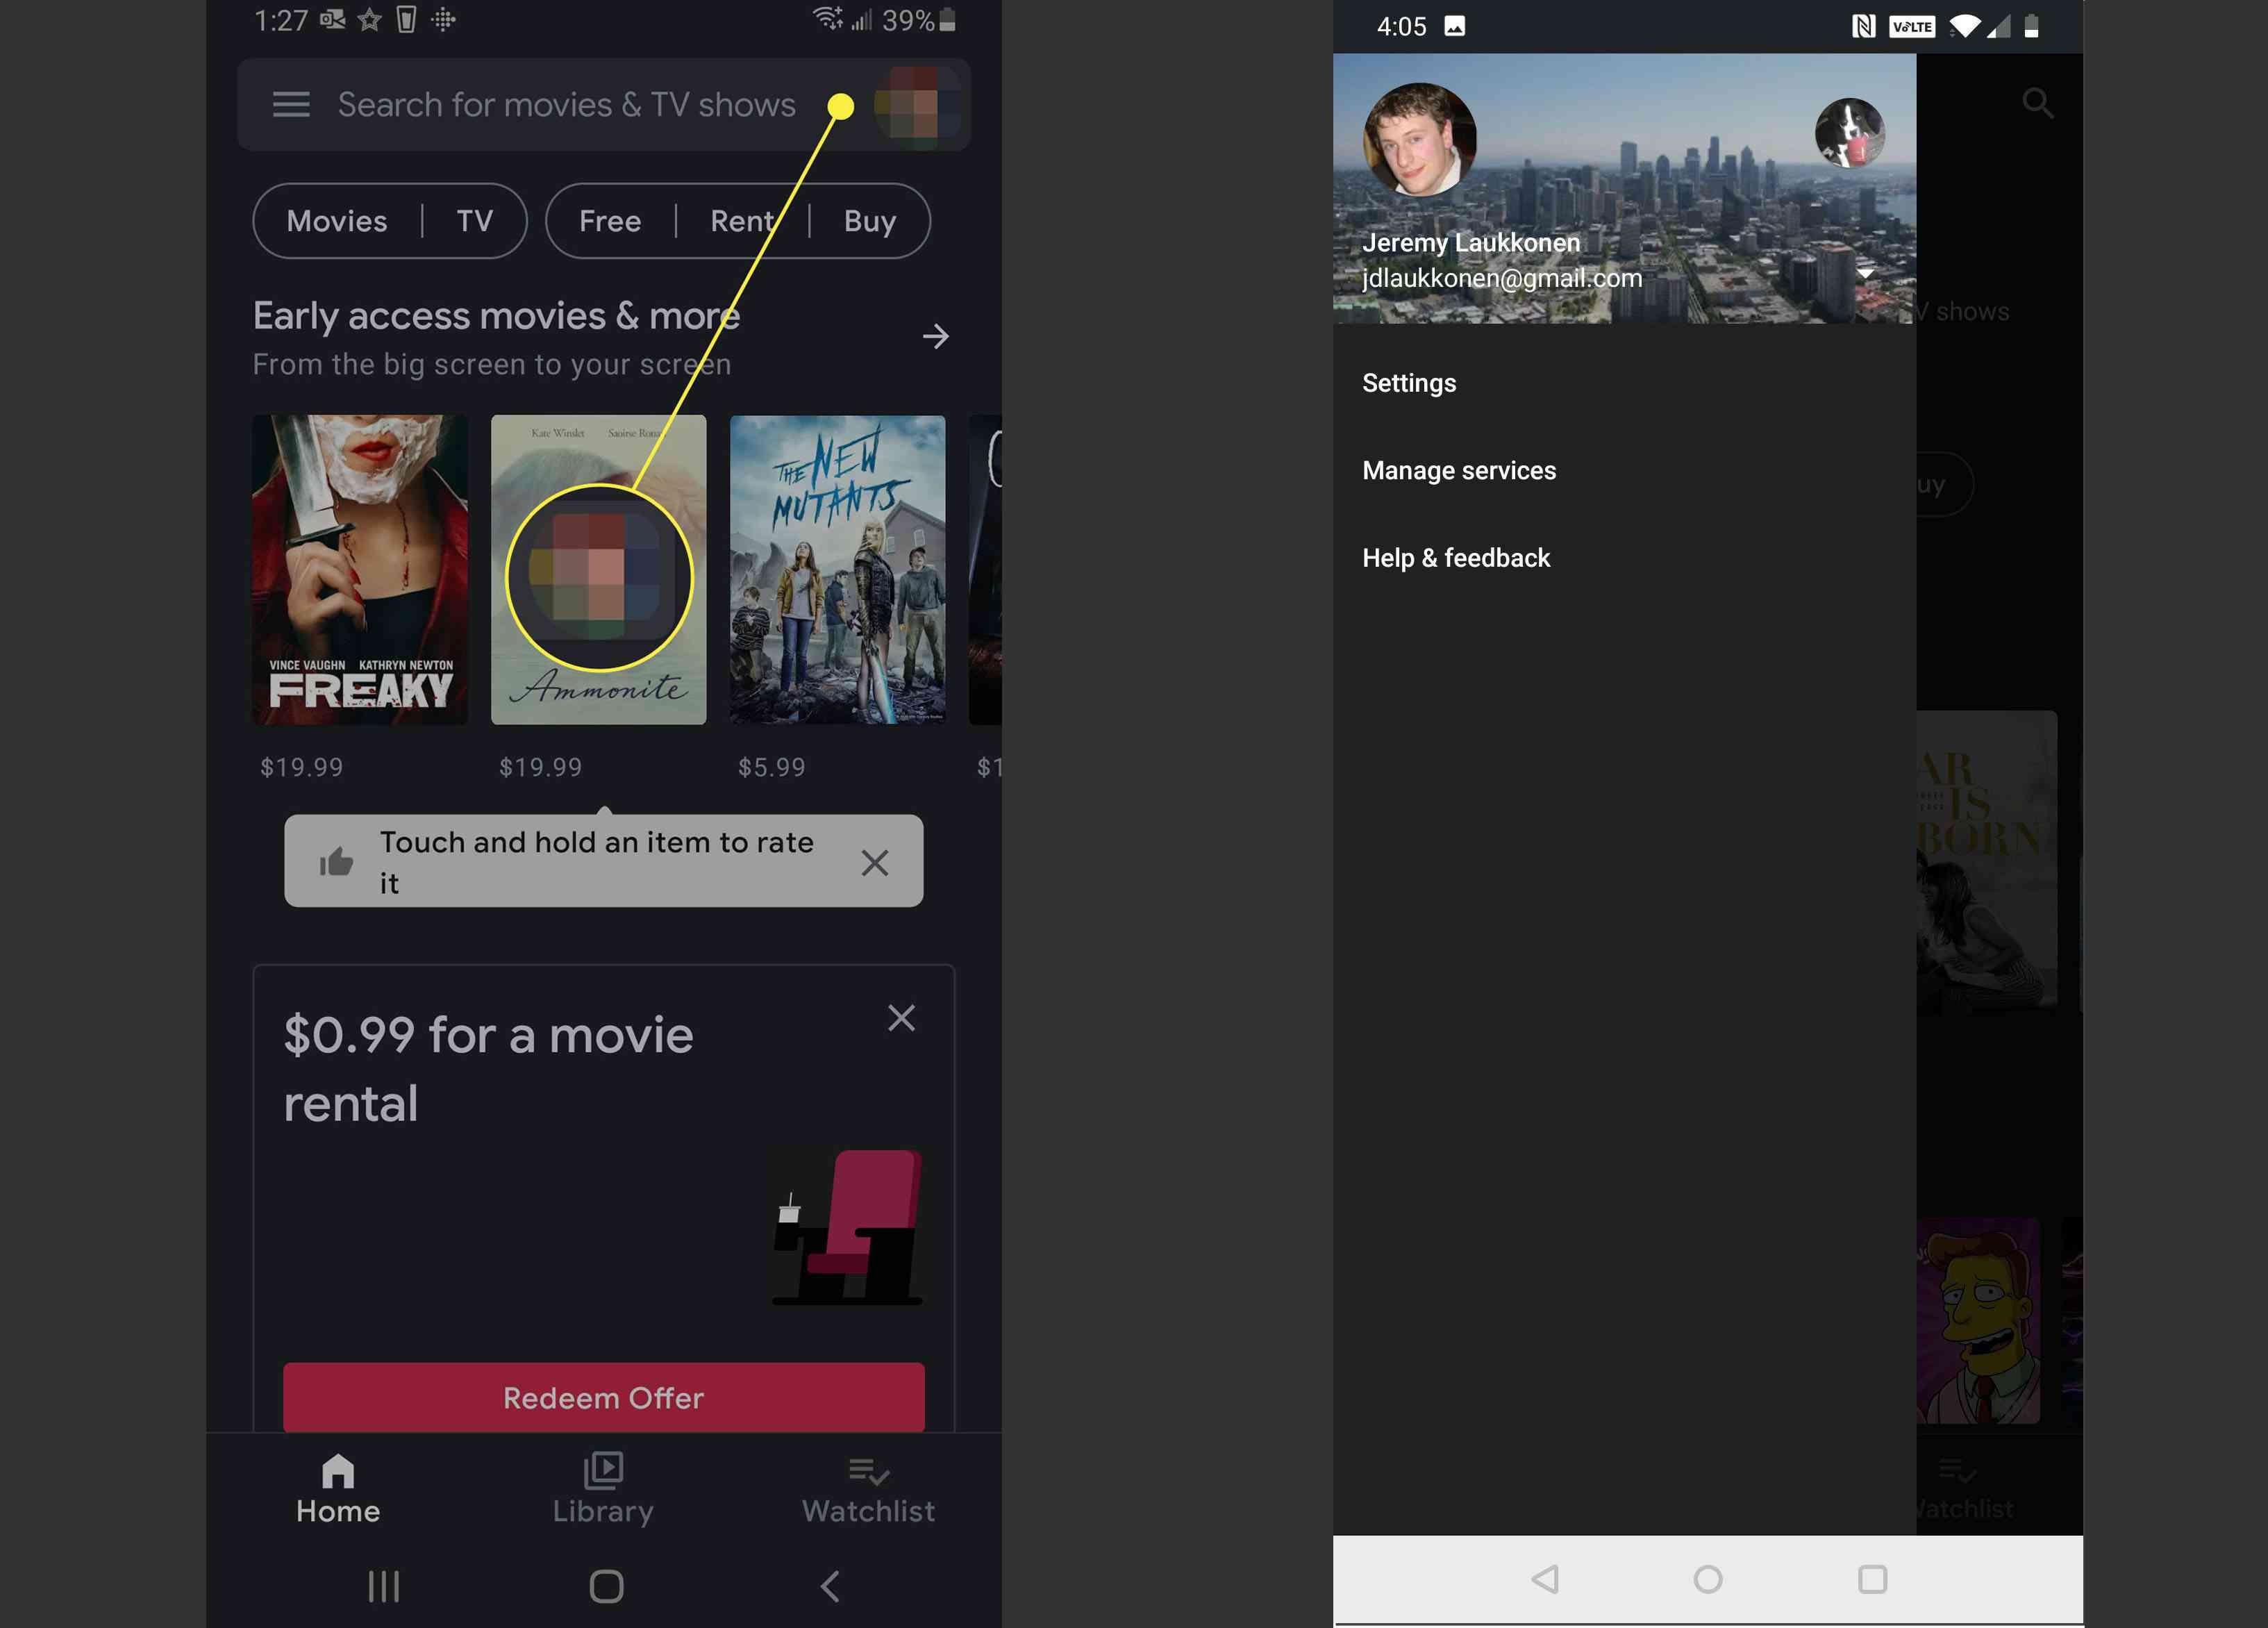 Google Play Movies app user menu.